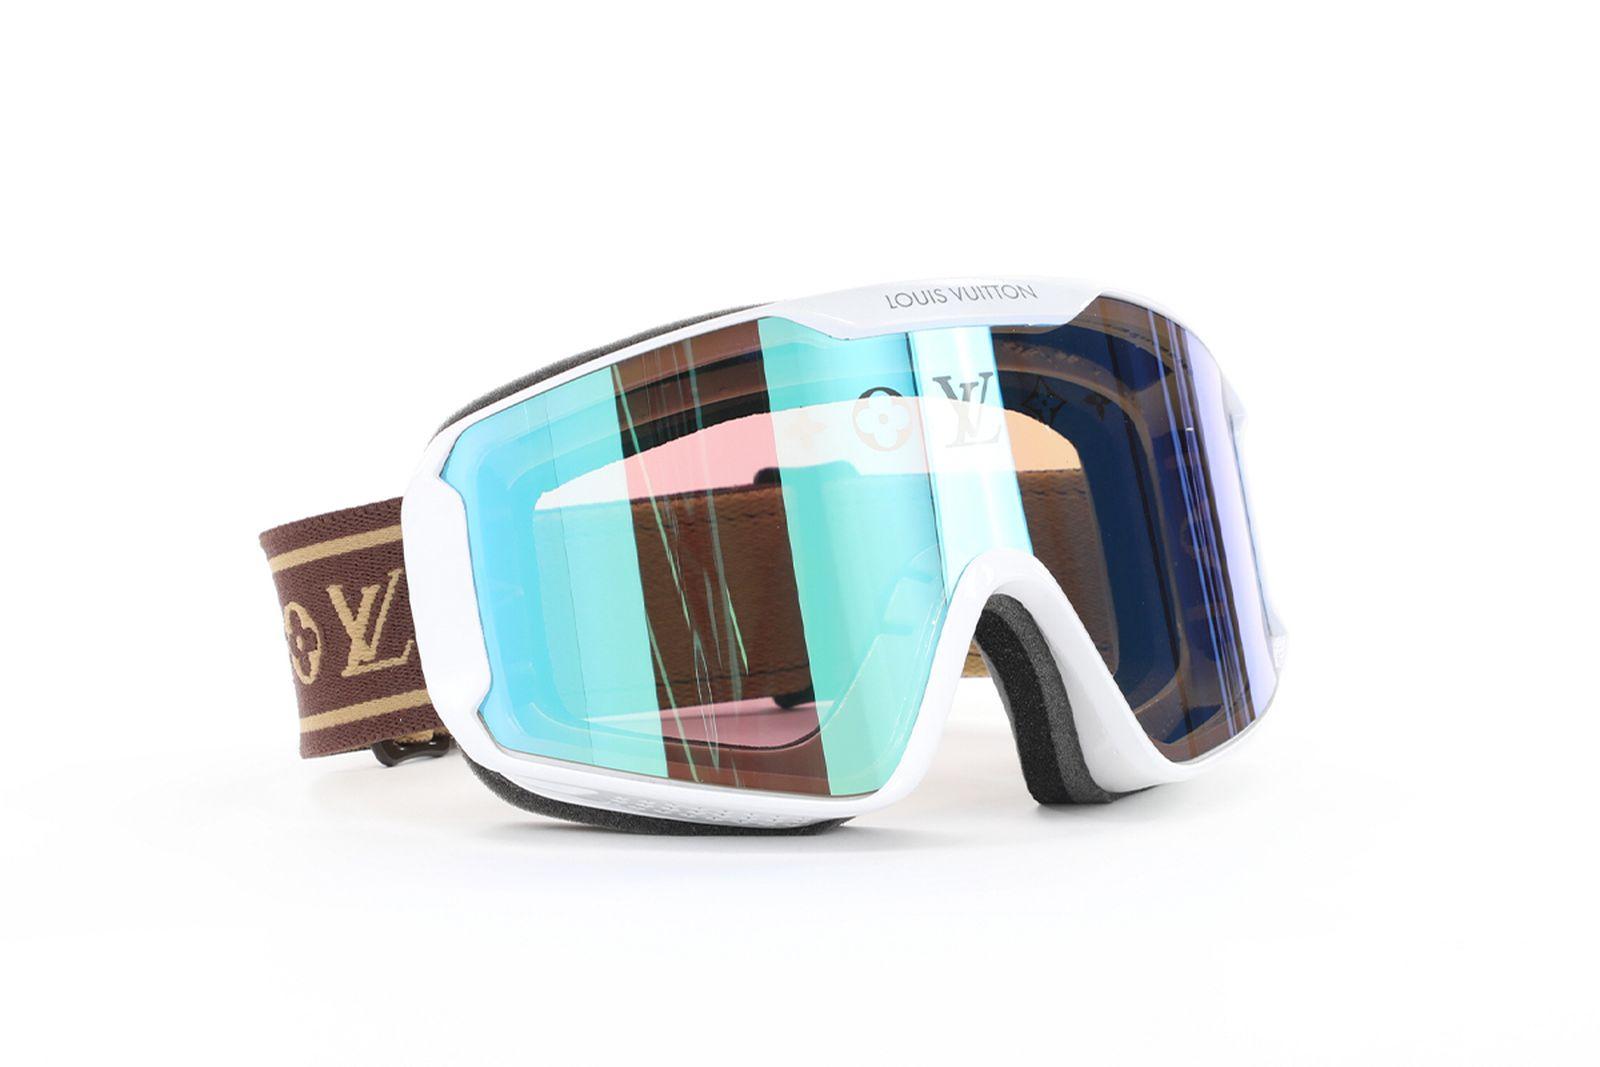 louis-vuitton-fall-winter-2021-accessories-09